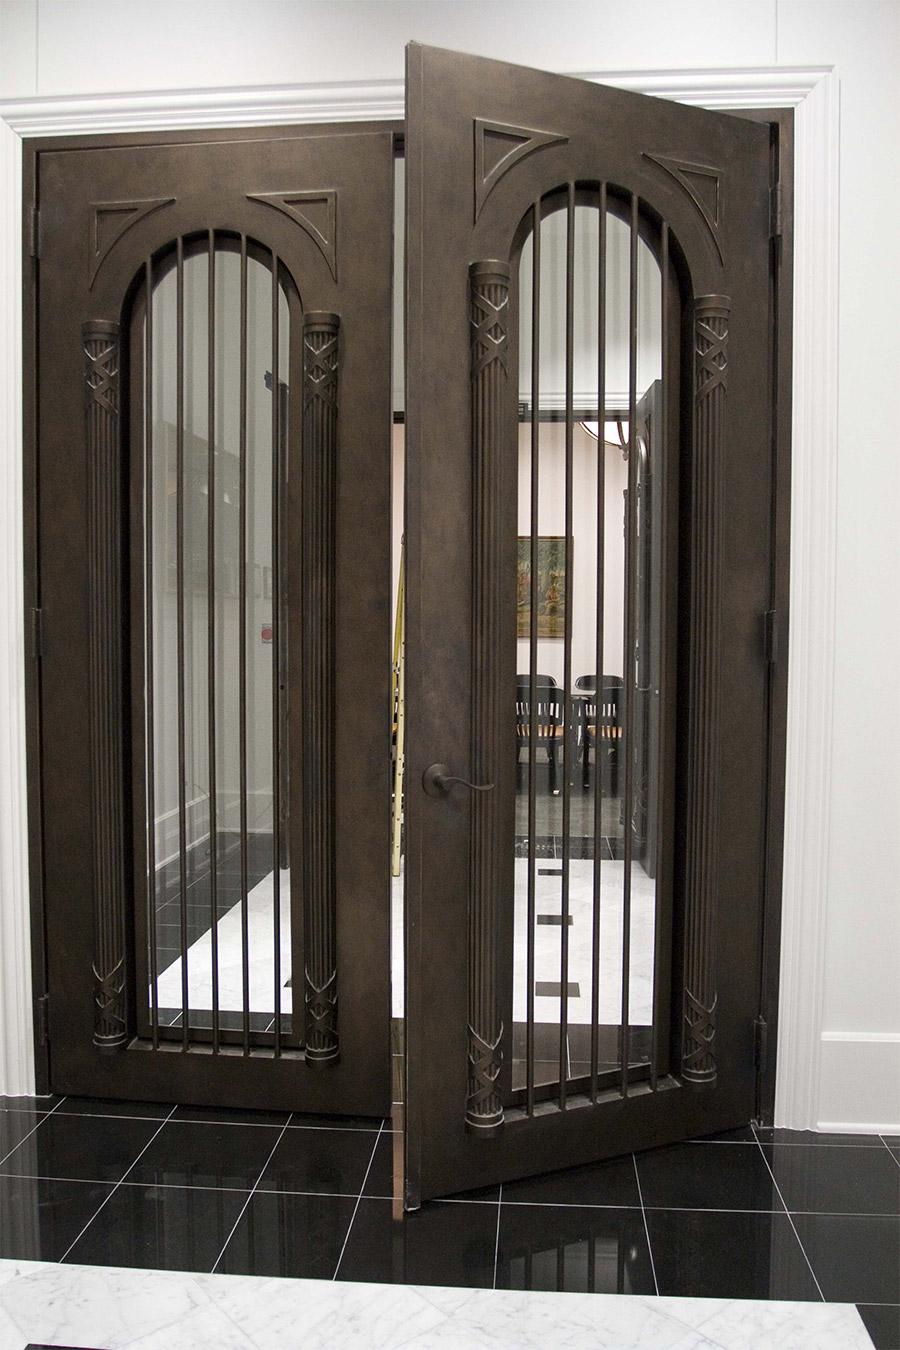 Worthington-CLA-S2-073-Classic-Steel-Doors-(40)-como-objeto-inteligente-1